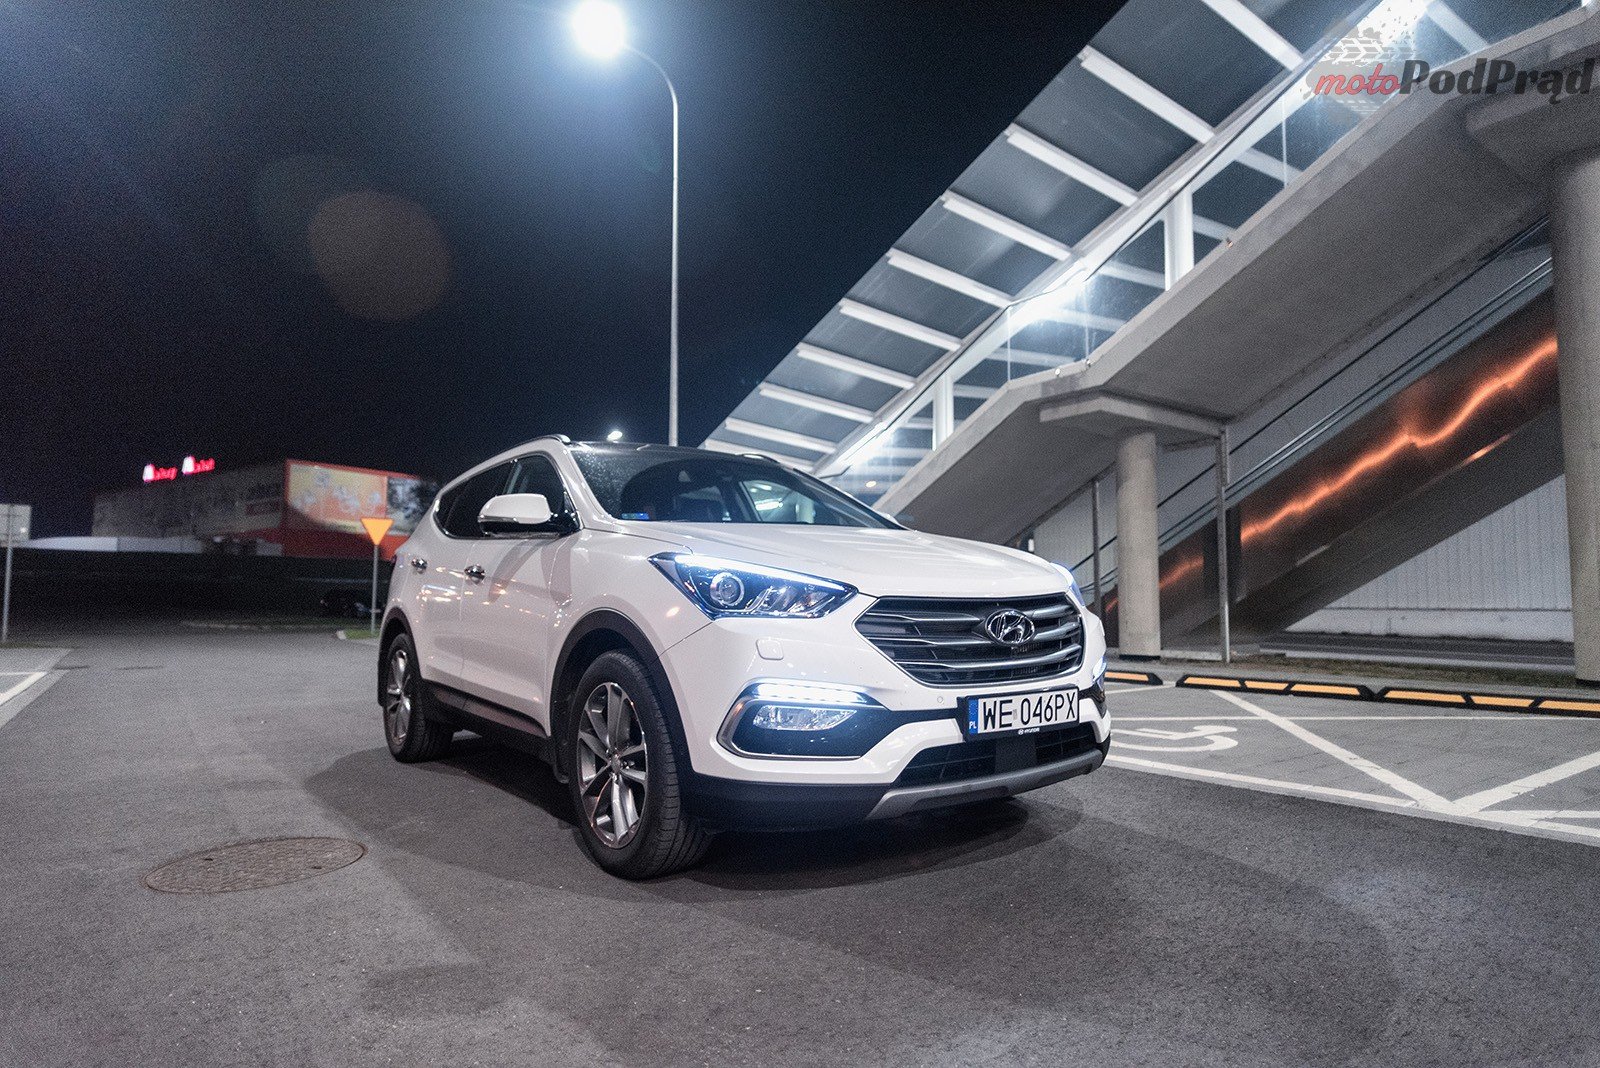 Hyundai Santa Fe 2 Test: Hyundai Santa Fe 2.2 CRDi 200 KM   wczasy na kołach